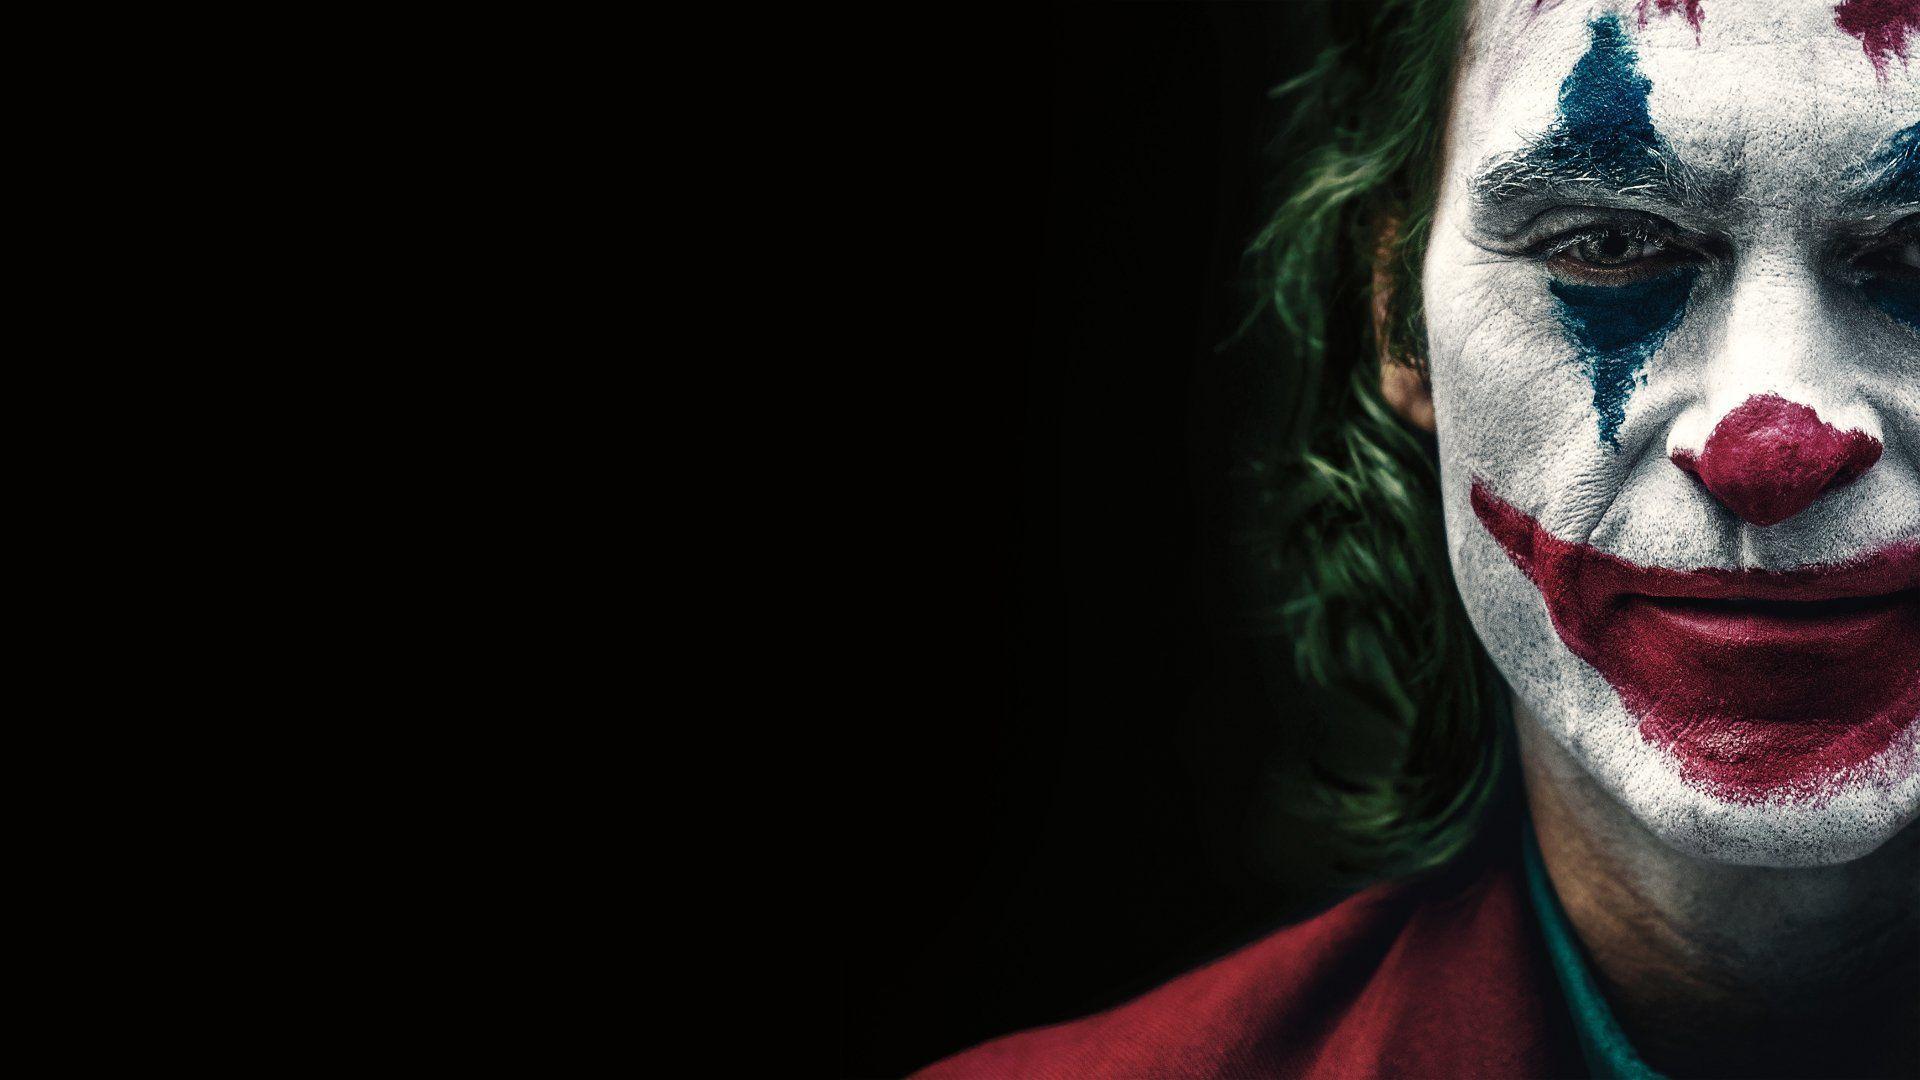 Joker 2k Wallpapers Top Free Joker 2k Backgrounds Wallpaperaccess